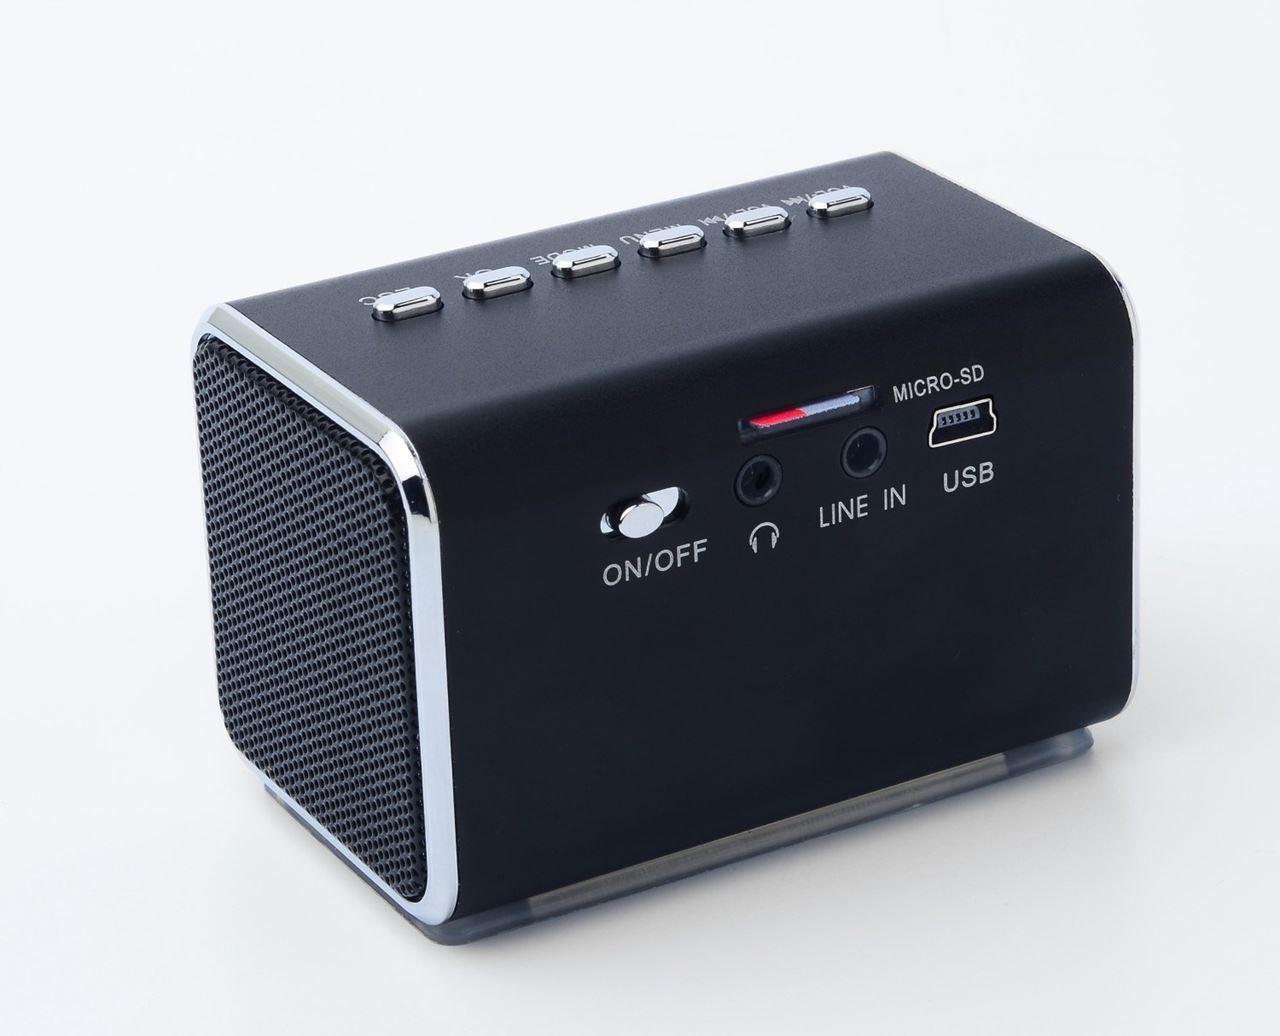 Telecamera Nascosta Da Esterno : Sveglia con telecamera nascosta e display video hd motion spy